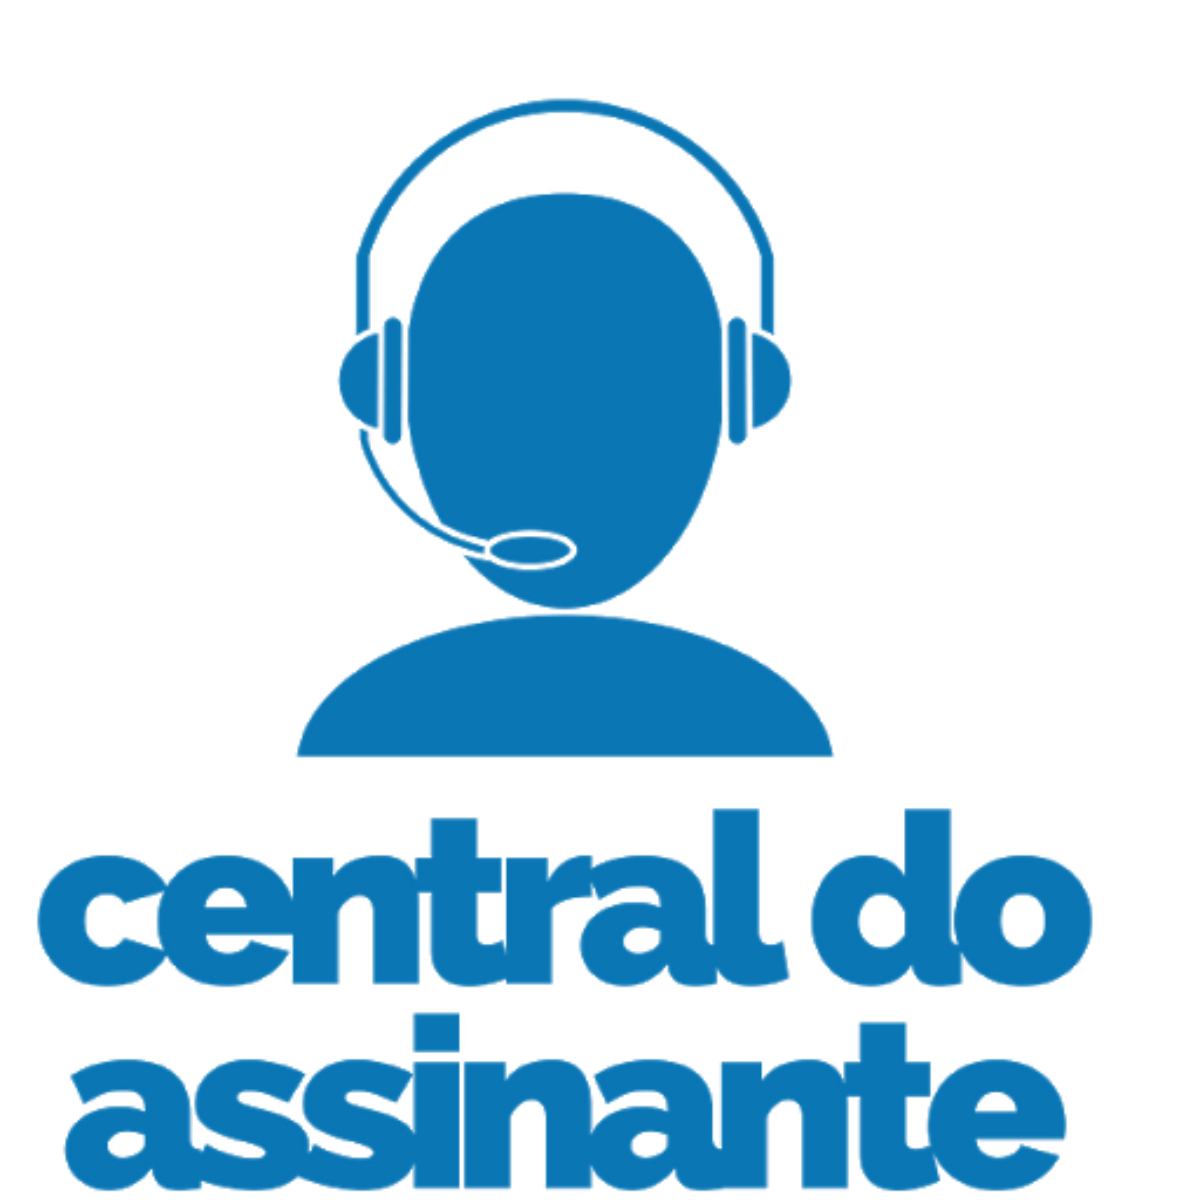 Central_do_Assinante_1x